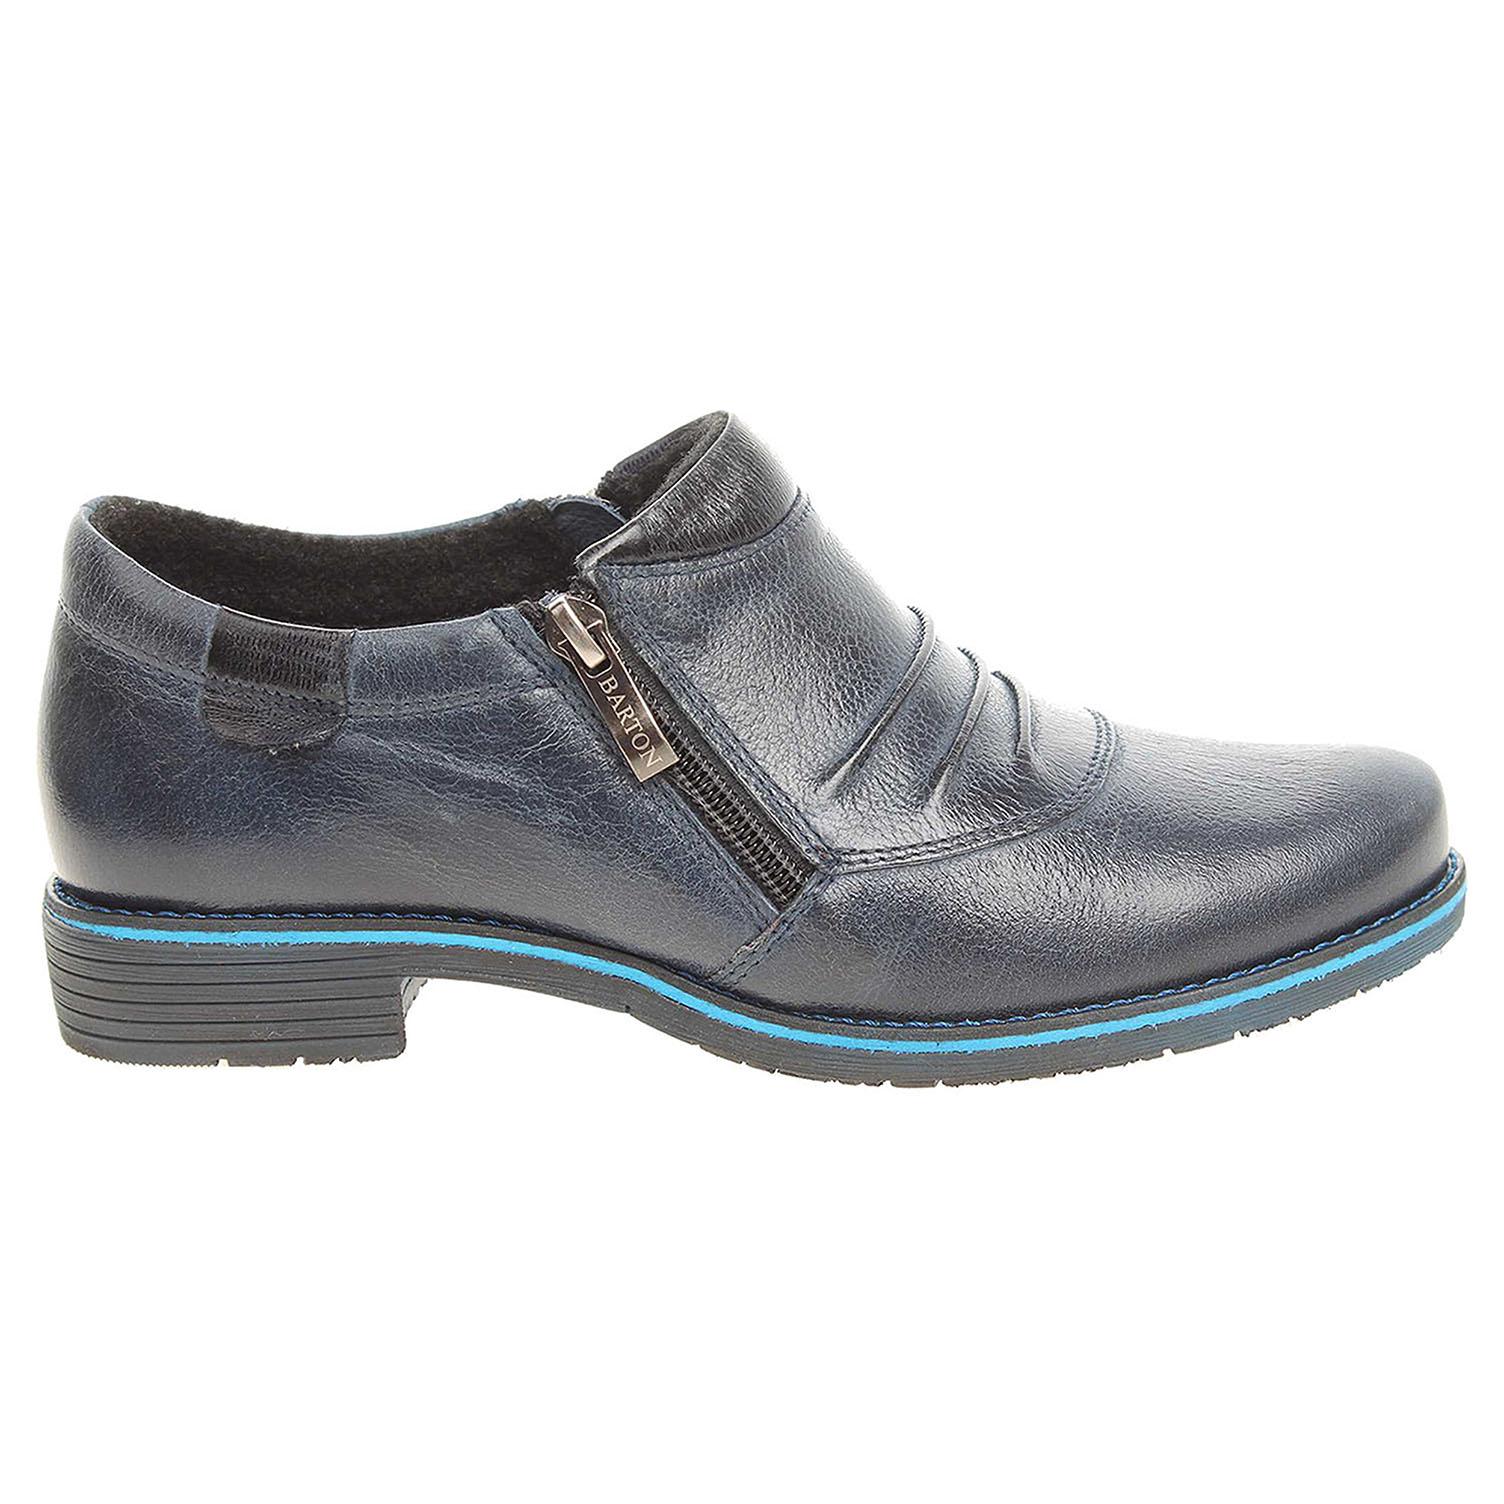 Ecco Barton dámská obuv 11716 modrá 23200562 cb04869aaf6